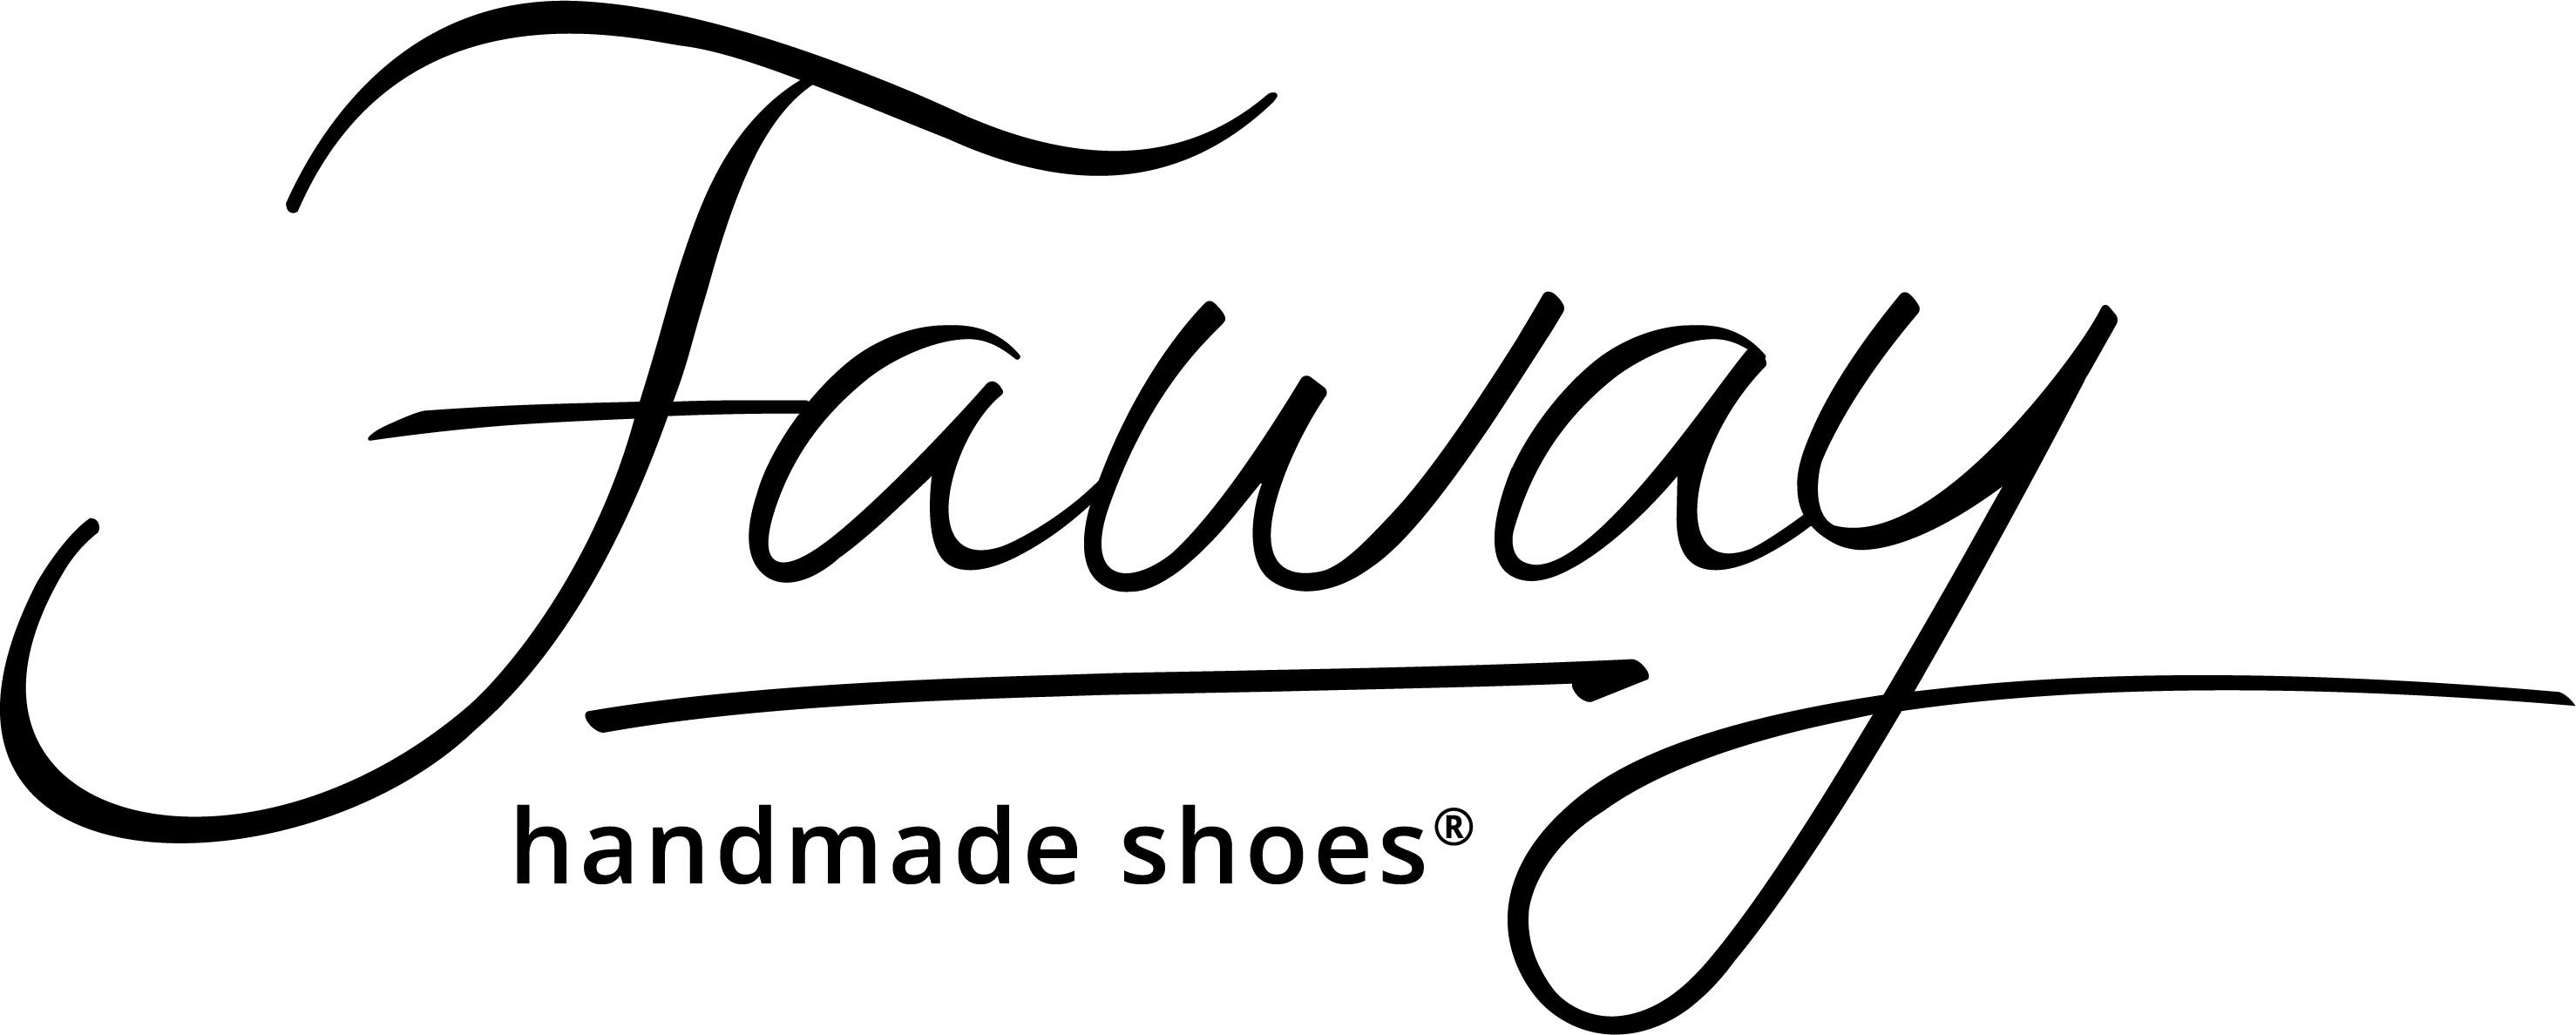 Faway - Handmade Shoes